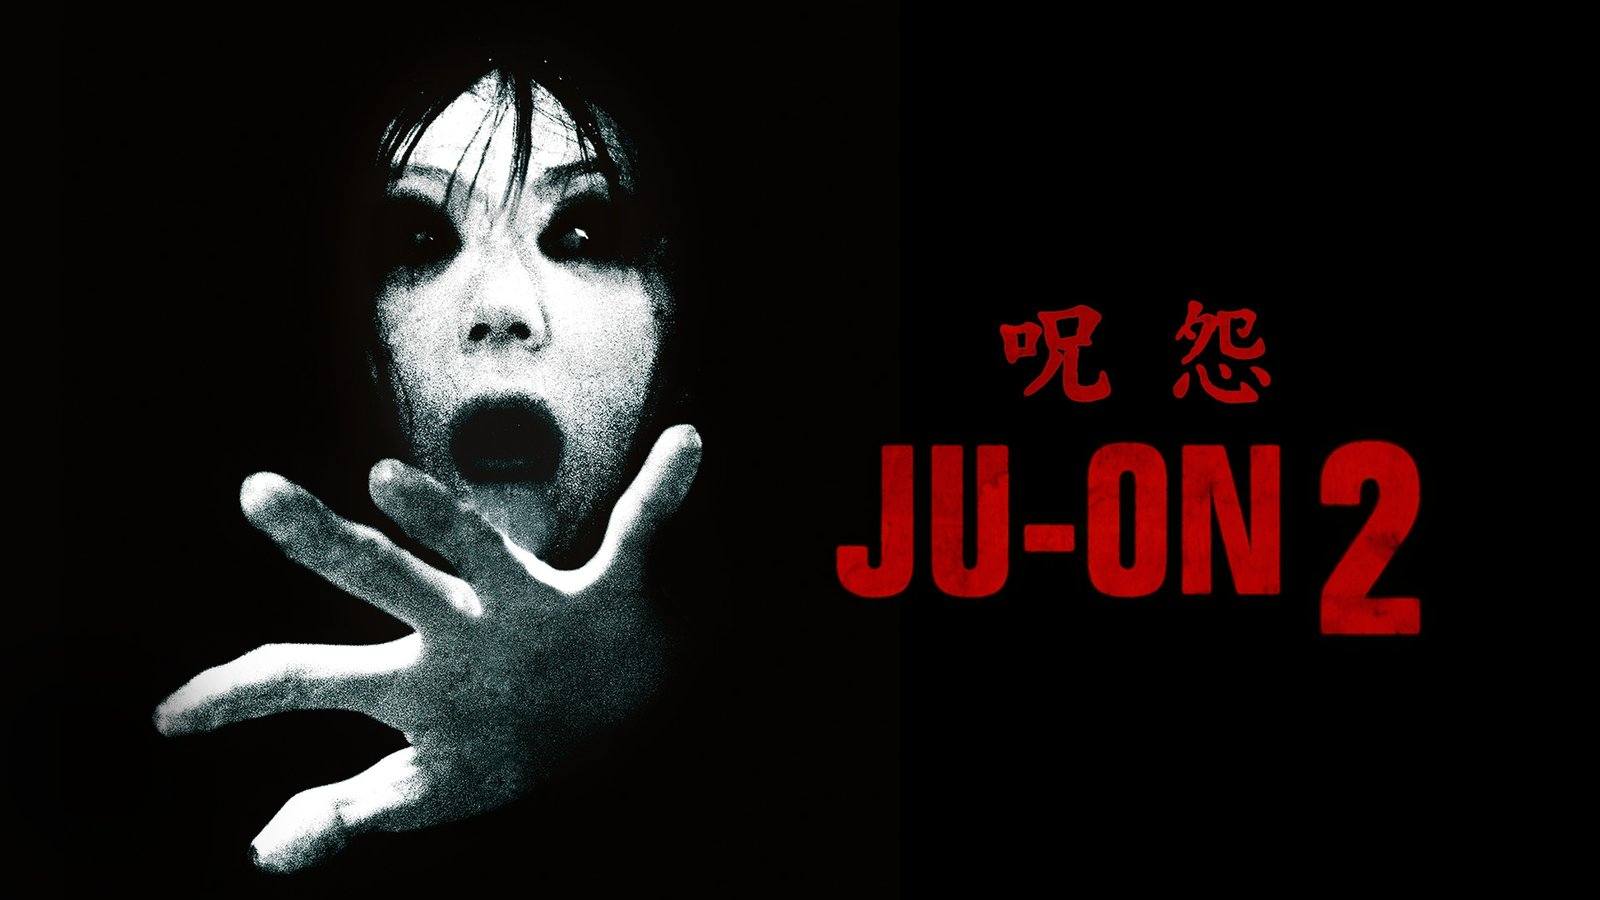 Ju-On 2 - The Grudge 2